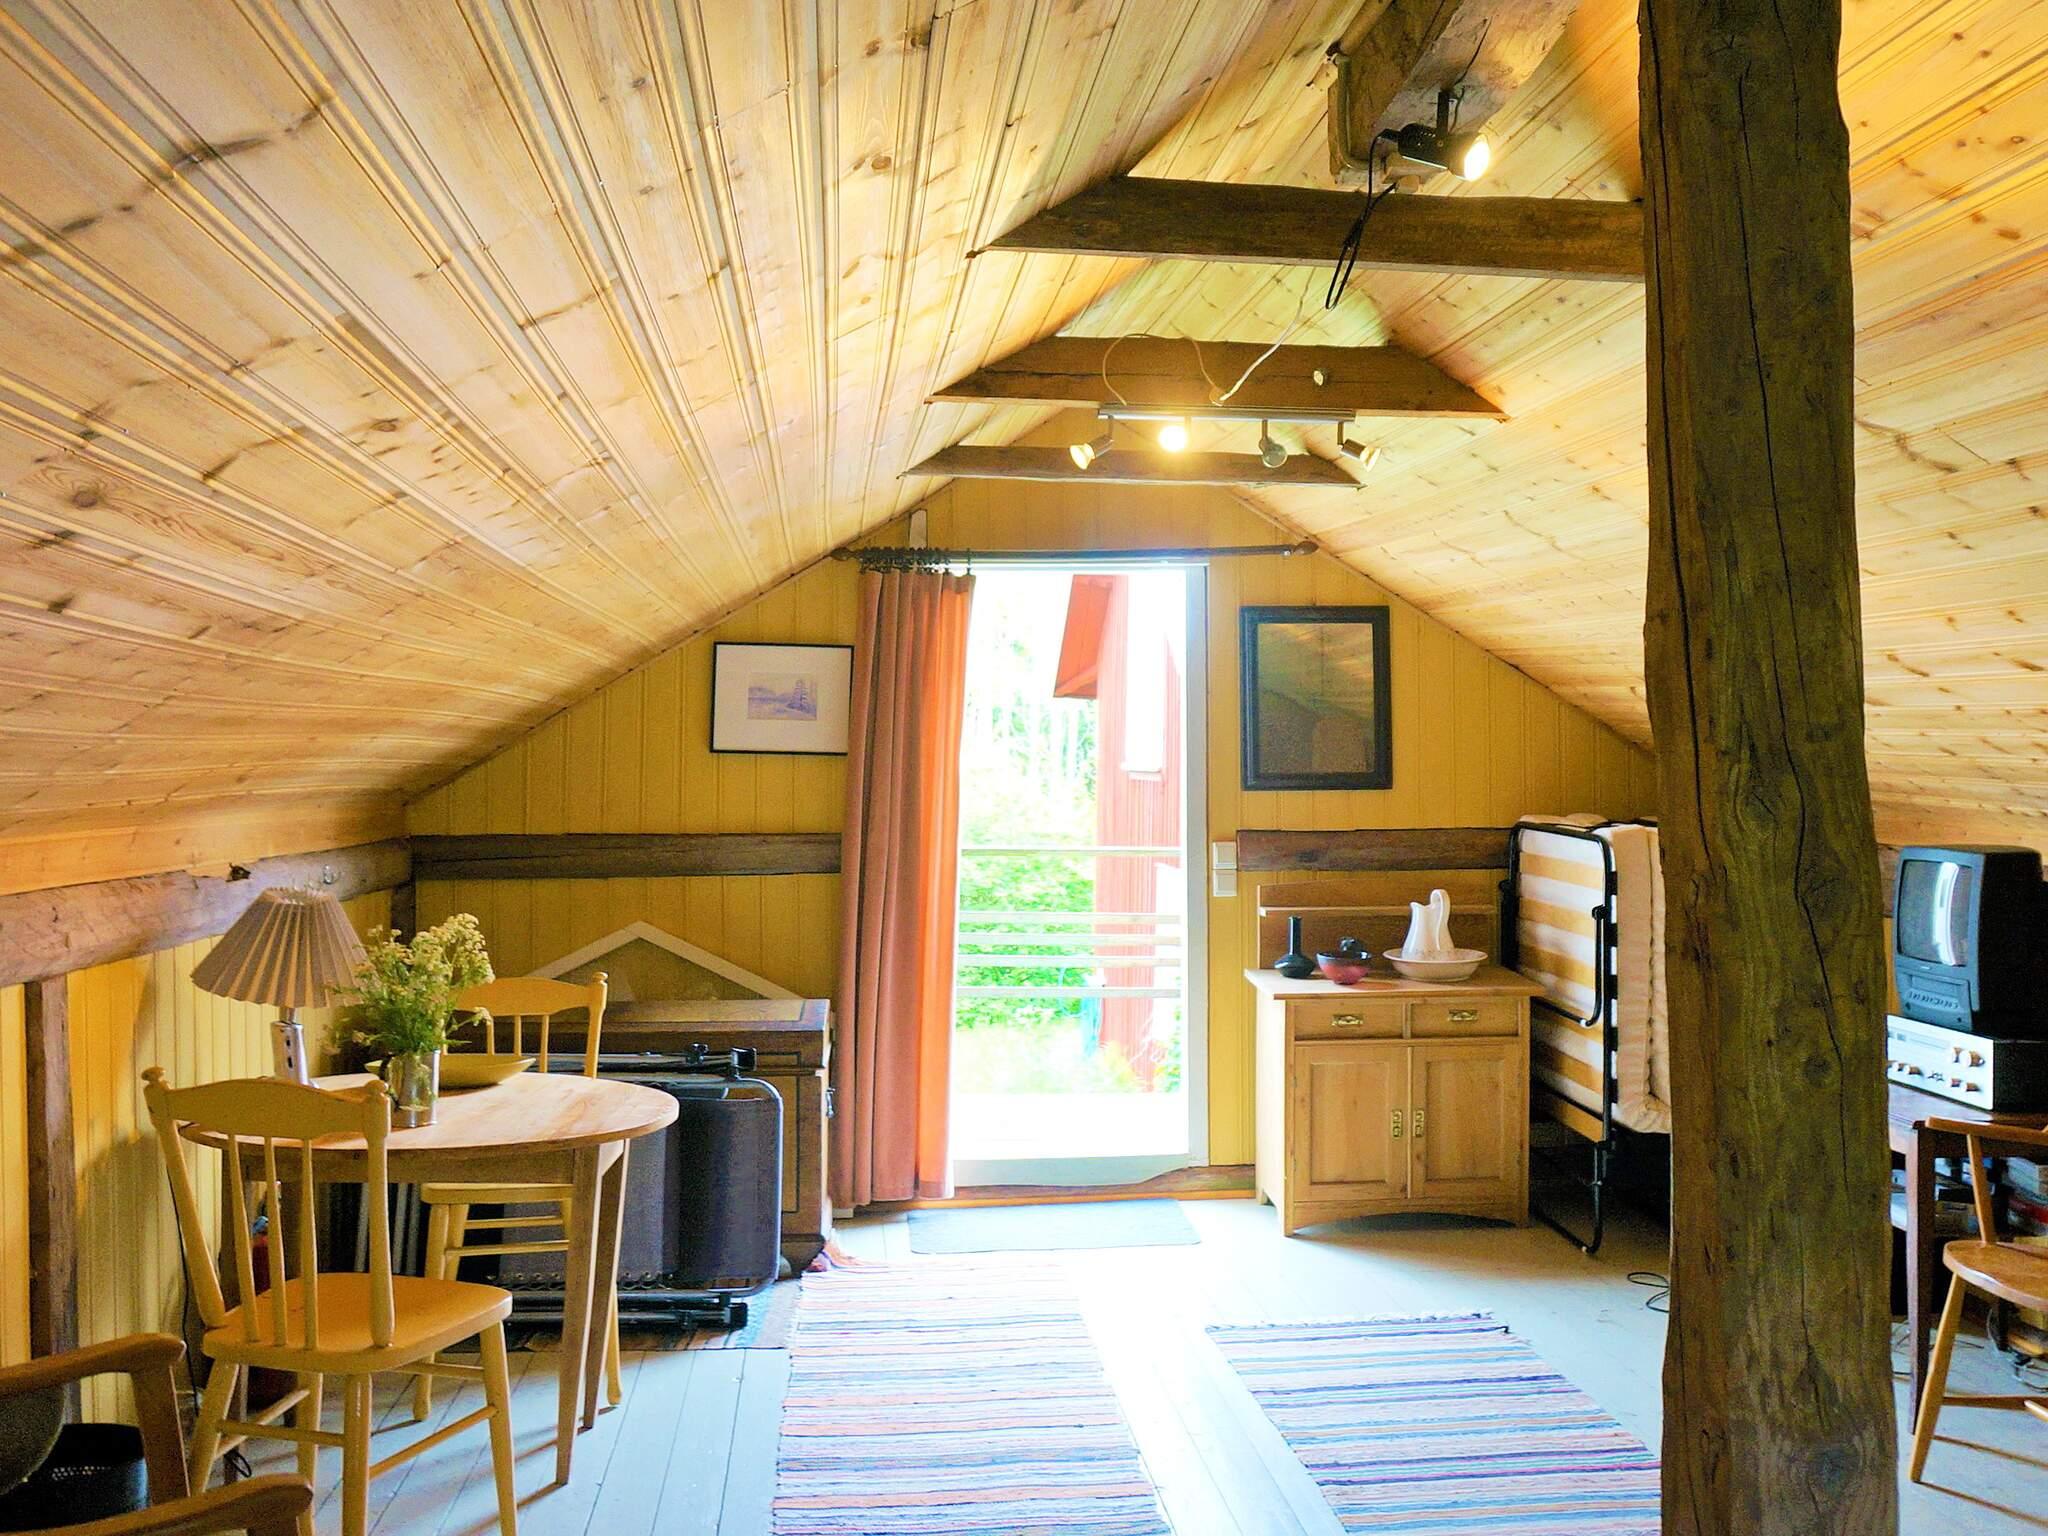 Ferienhaus Falköping (2636837), Trädet, Västra Götaland län, Westschweden, Schweden, Bild 17